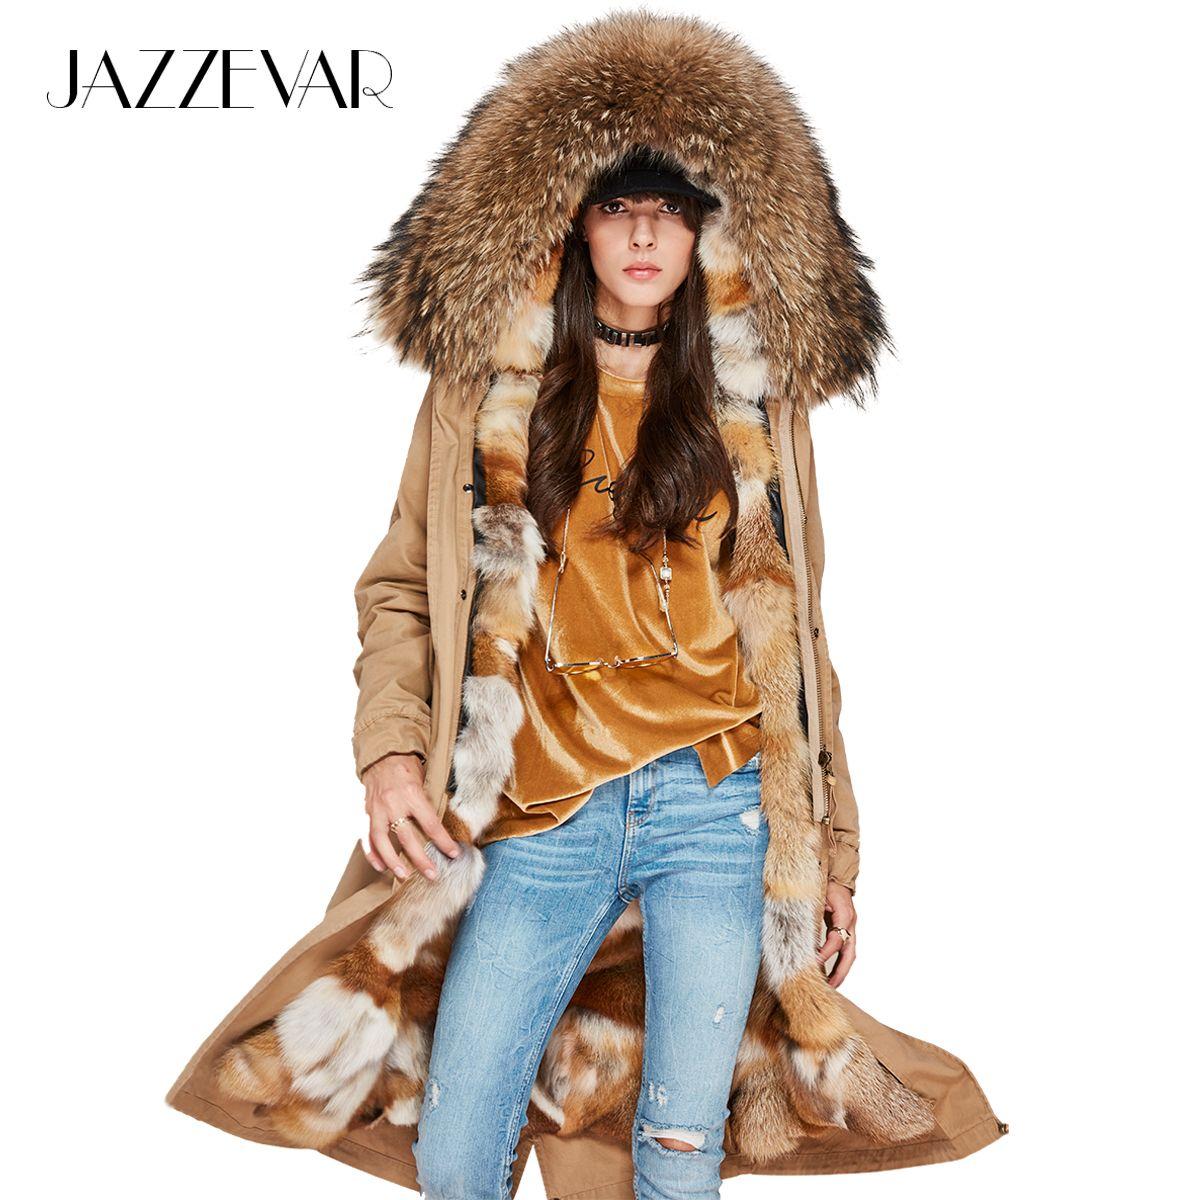 JAZZEVAR 2018 Neue Winter Mode Frau Luxuriöse Echt Fuchs pelz futter X-Lange Parka Große Waschbär pelz Mit Kapuze Mantel military Jacke